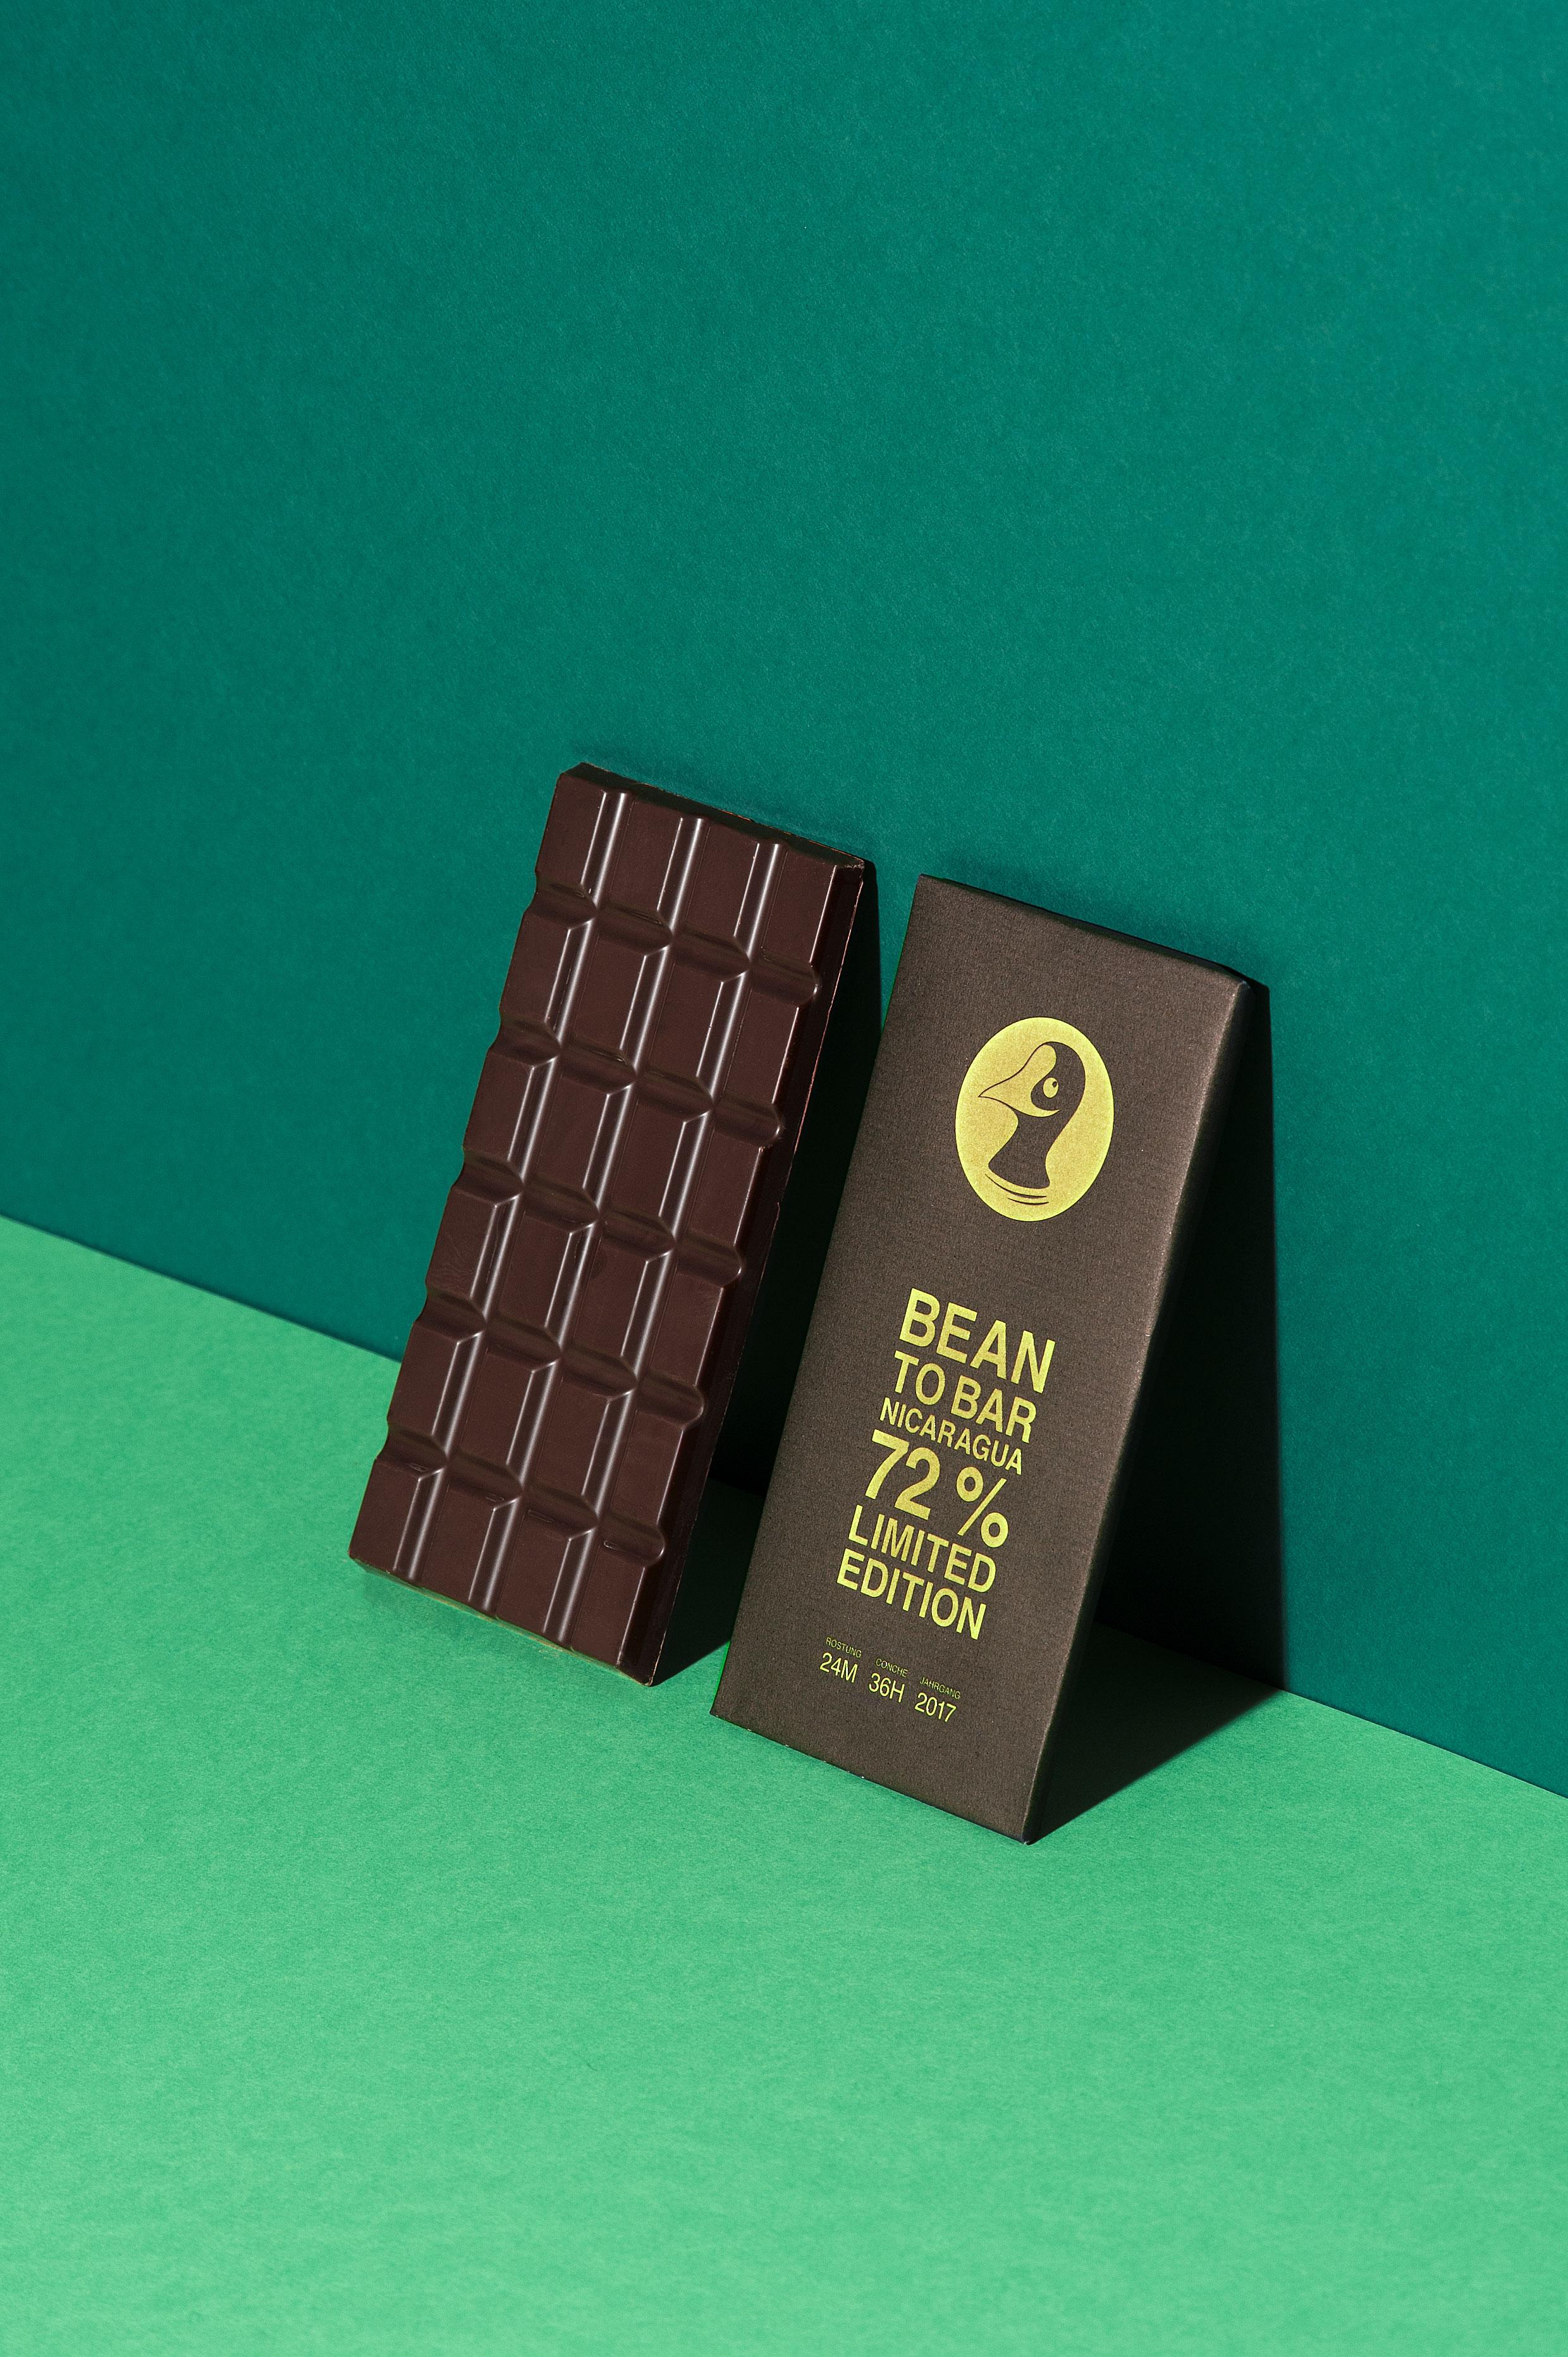 Taucherli Schokolade Bern, Fotoshooting, Fotograf